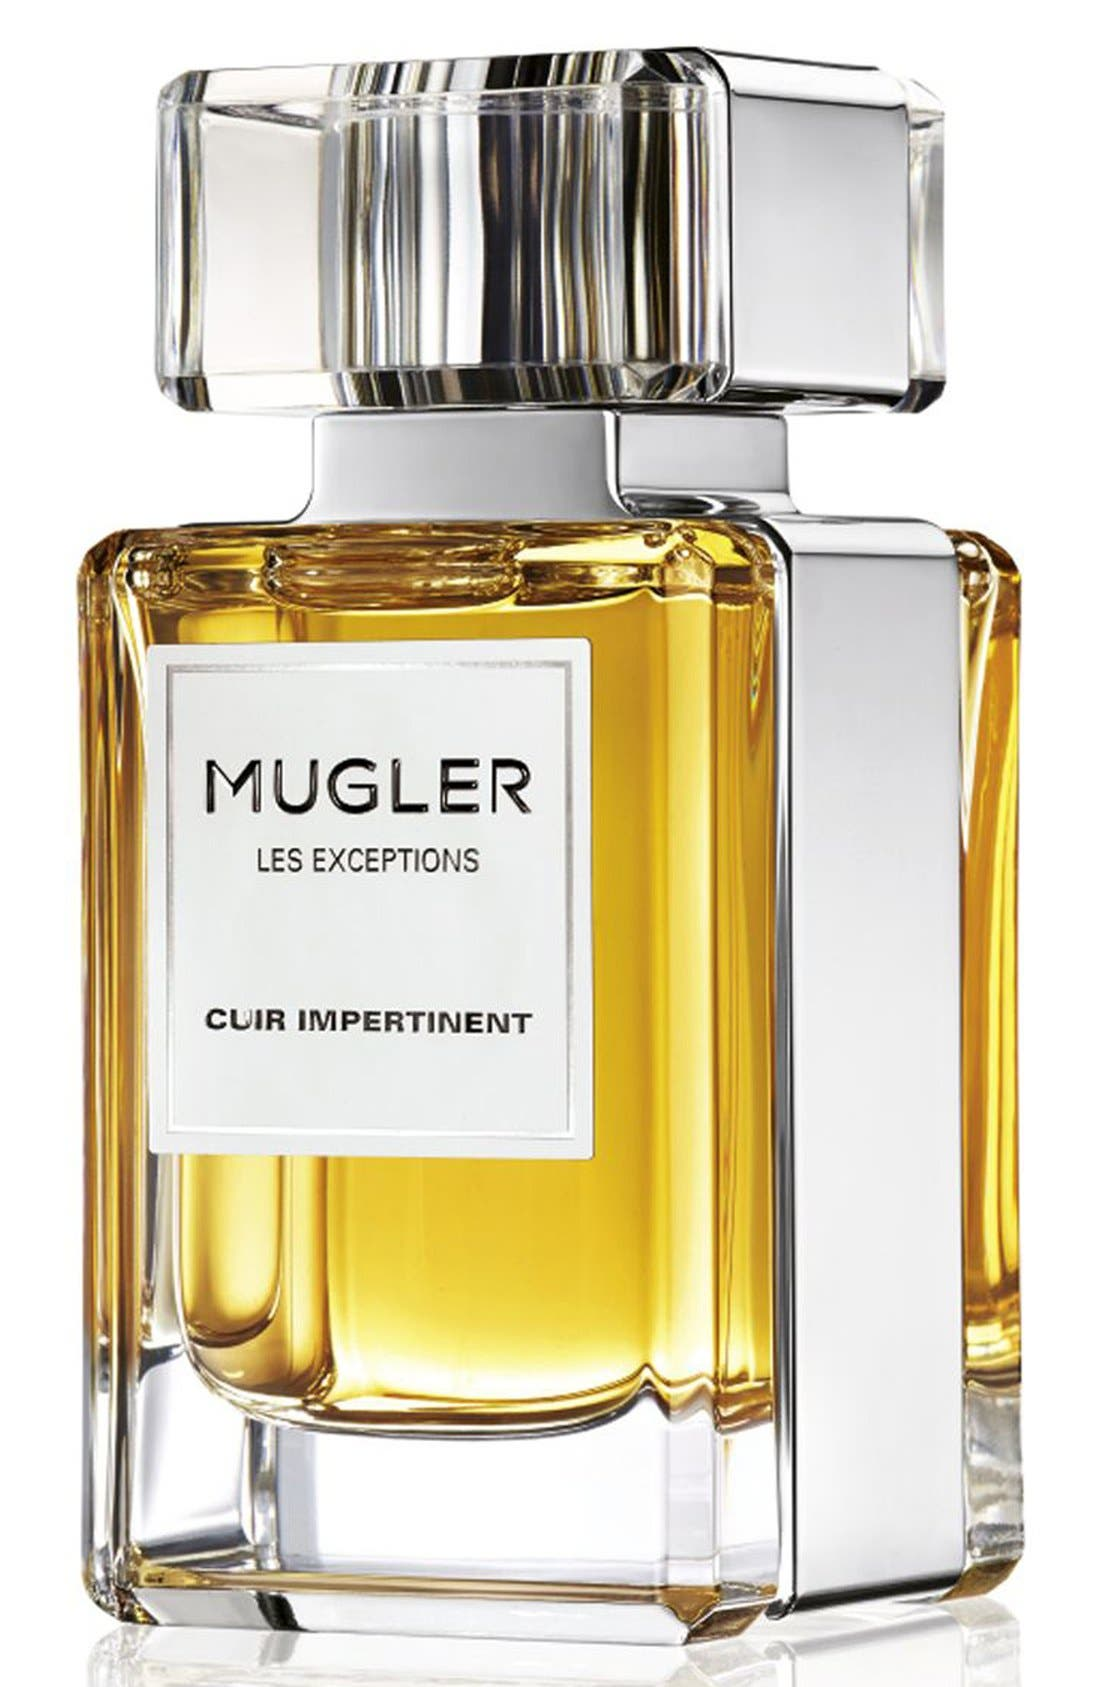 Mugler 'Les Exceptions - Cuir Impertinent' Eau de Parfum Refillable Spray (Nordstrom Exclusive)